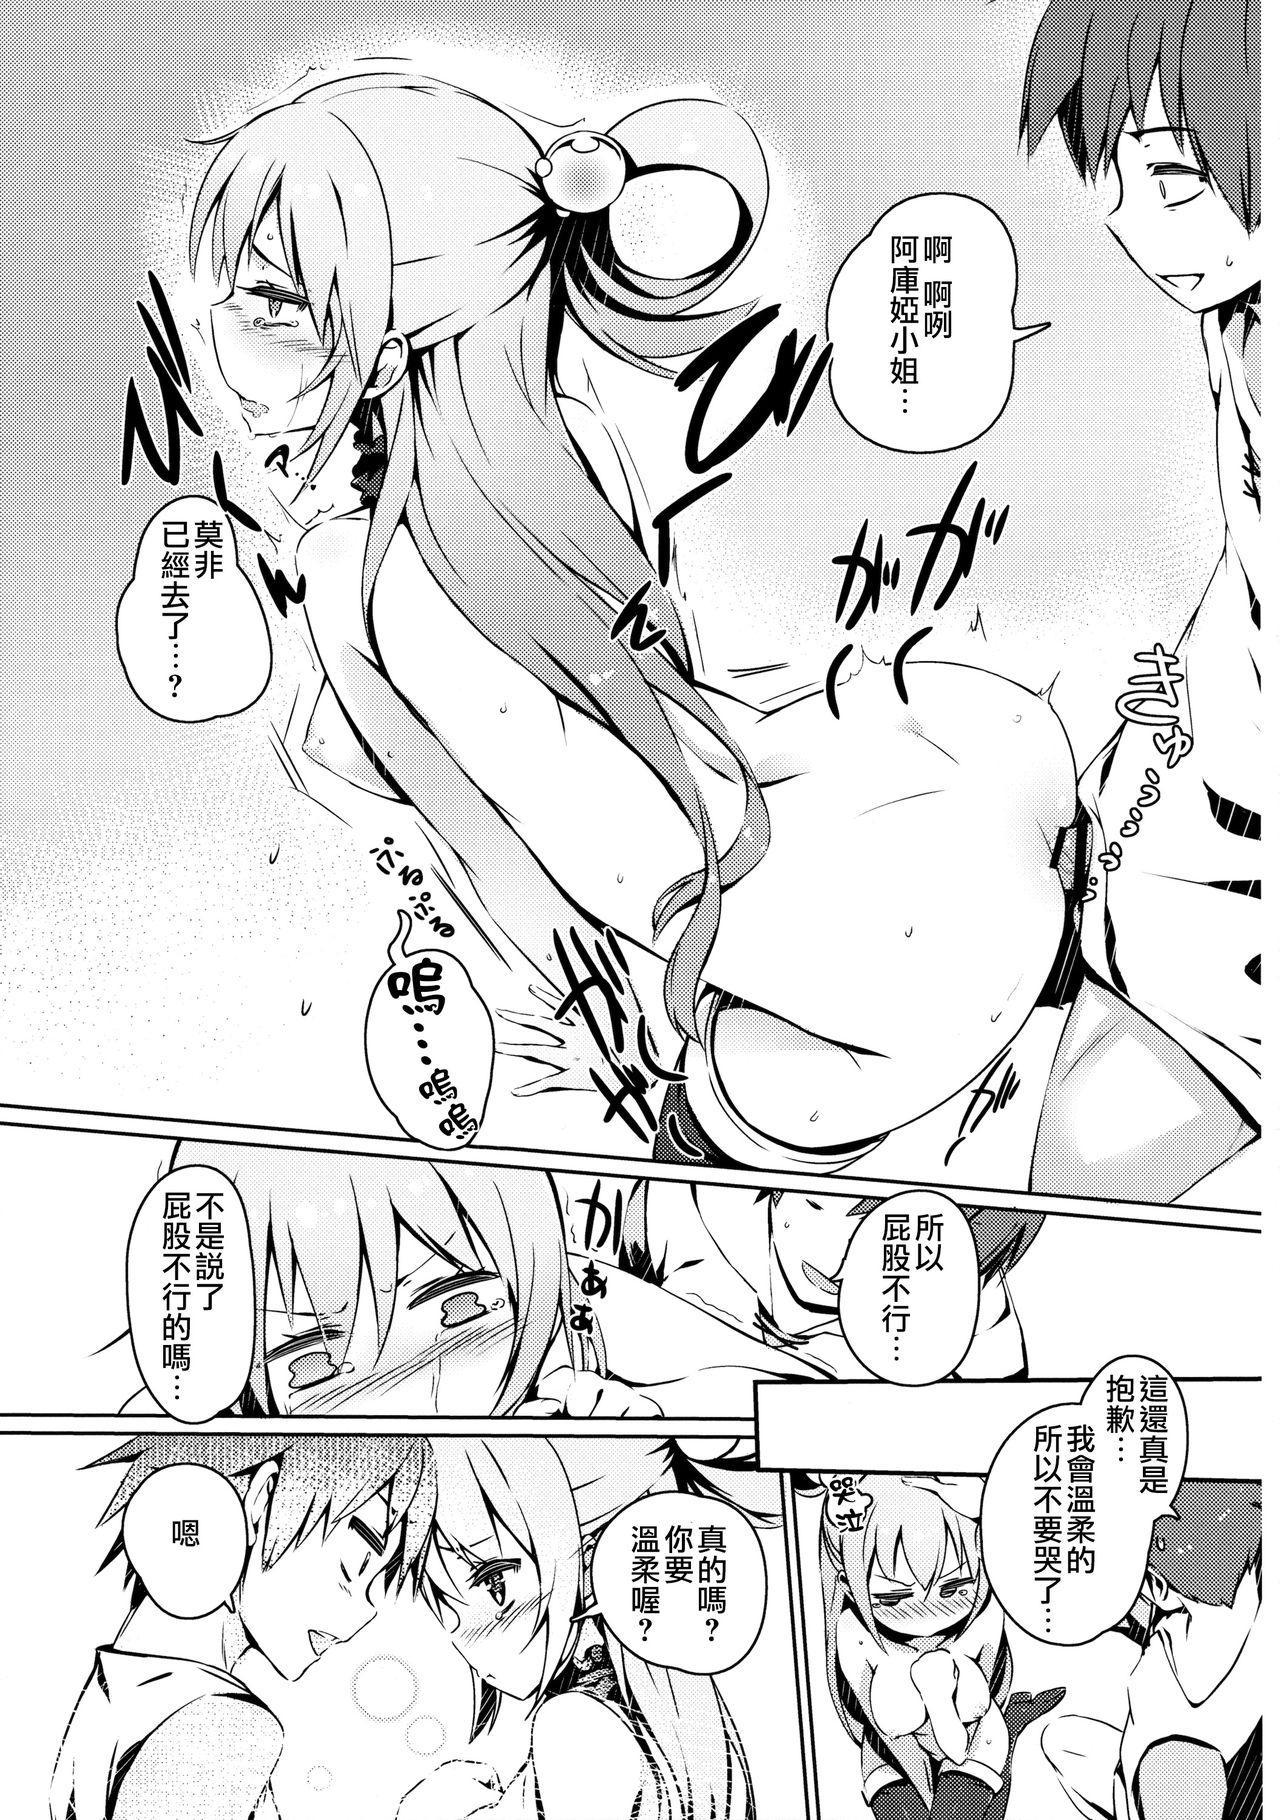 Kono Nikutarashii Megami no Icha Love o! | 為這個討厭的女神獻上卿卿我我! 18